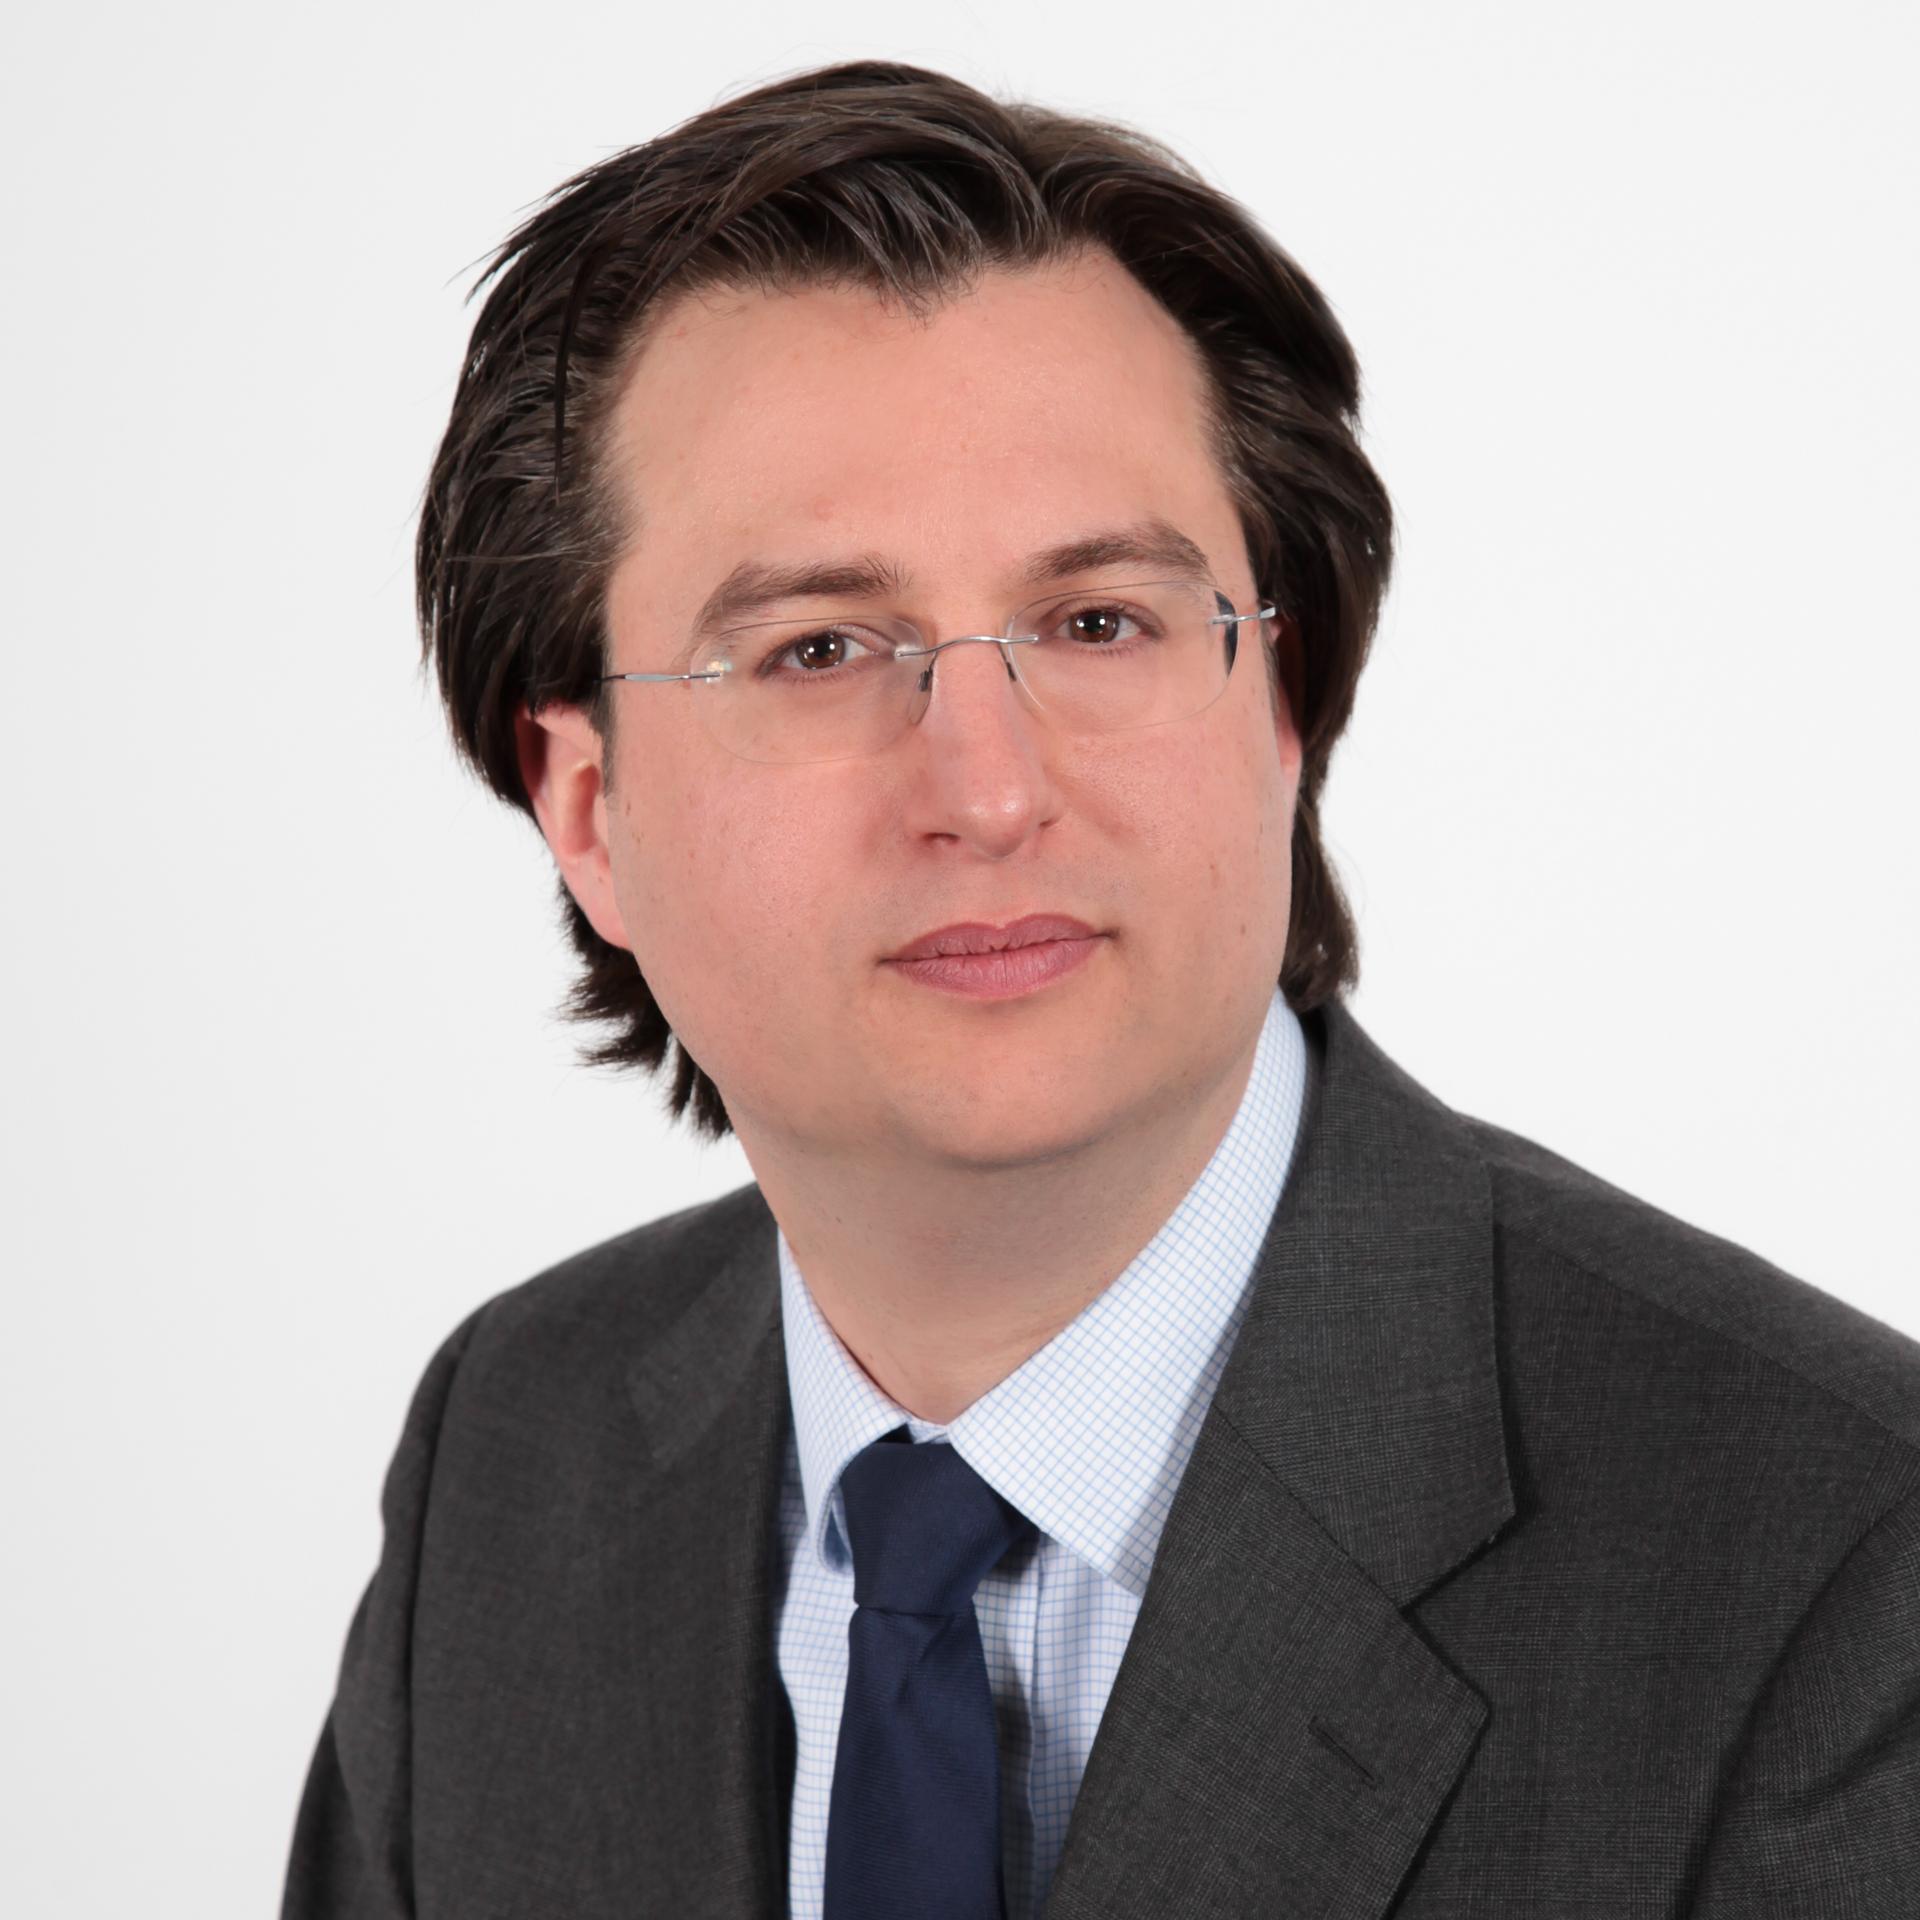 Martijn Brands